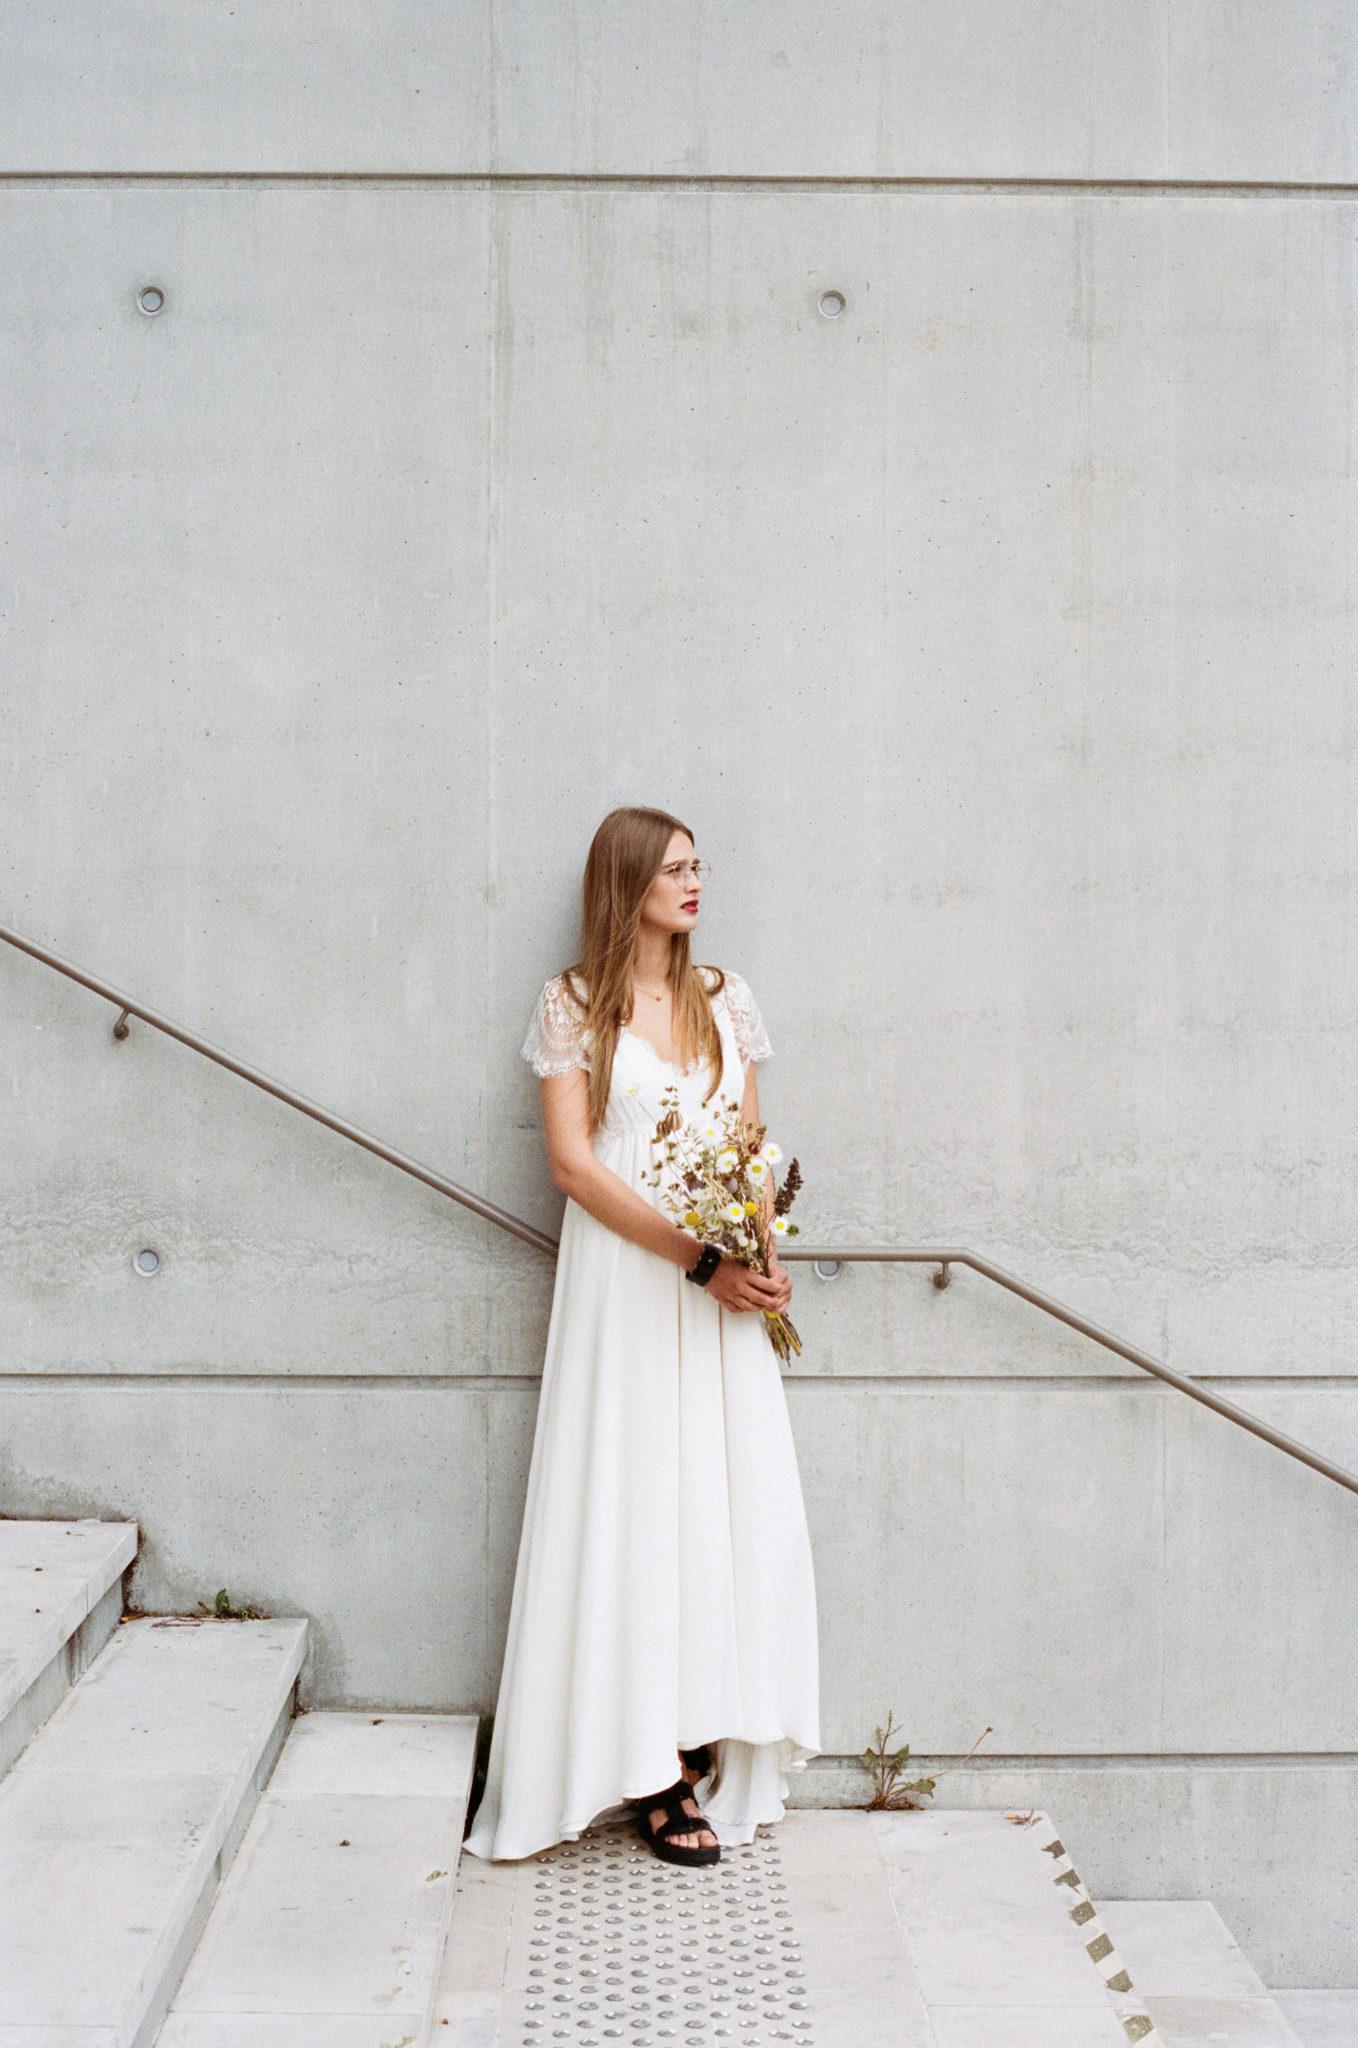 Le Wedding Urban Brides robe Elise Martimort lunettes Ray Ban Presqu'îleCaen